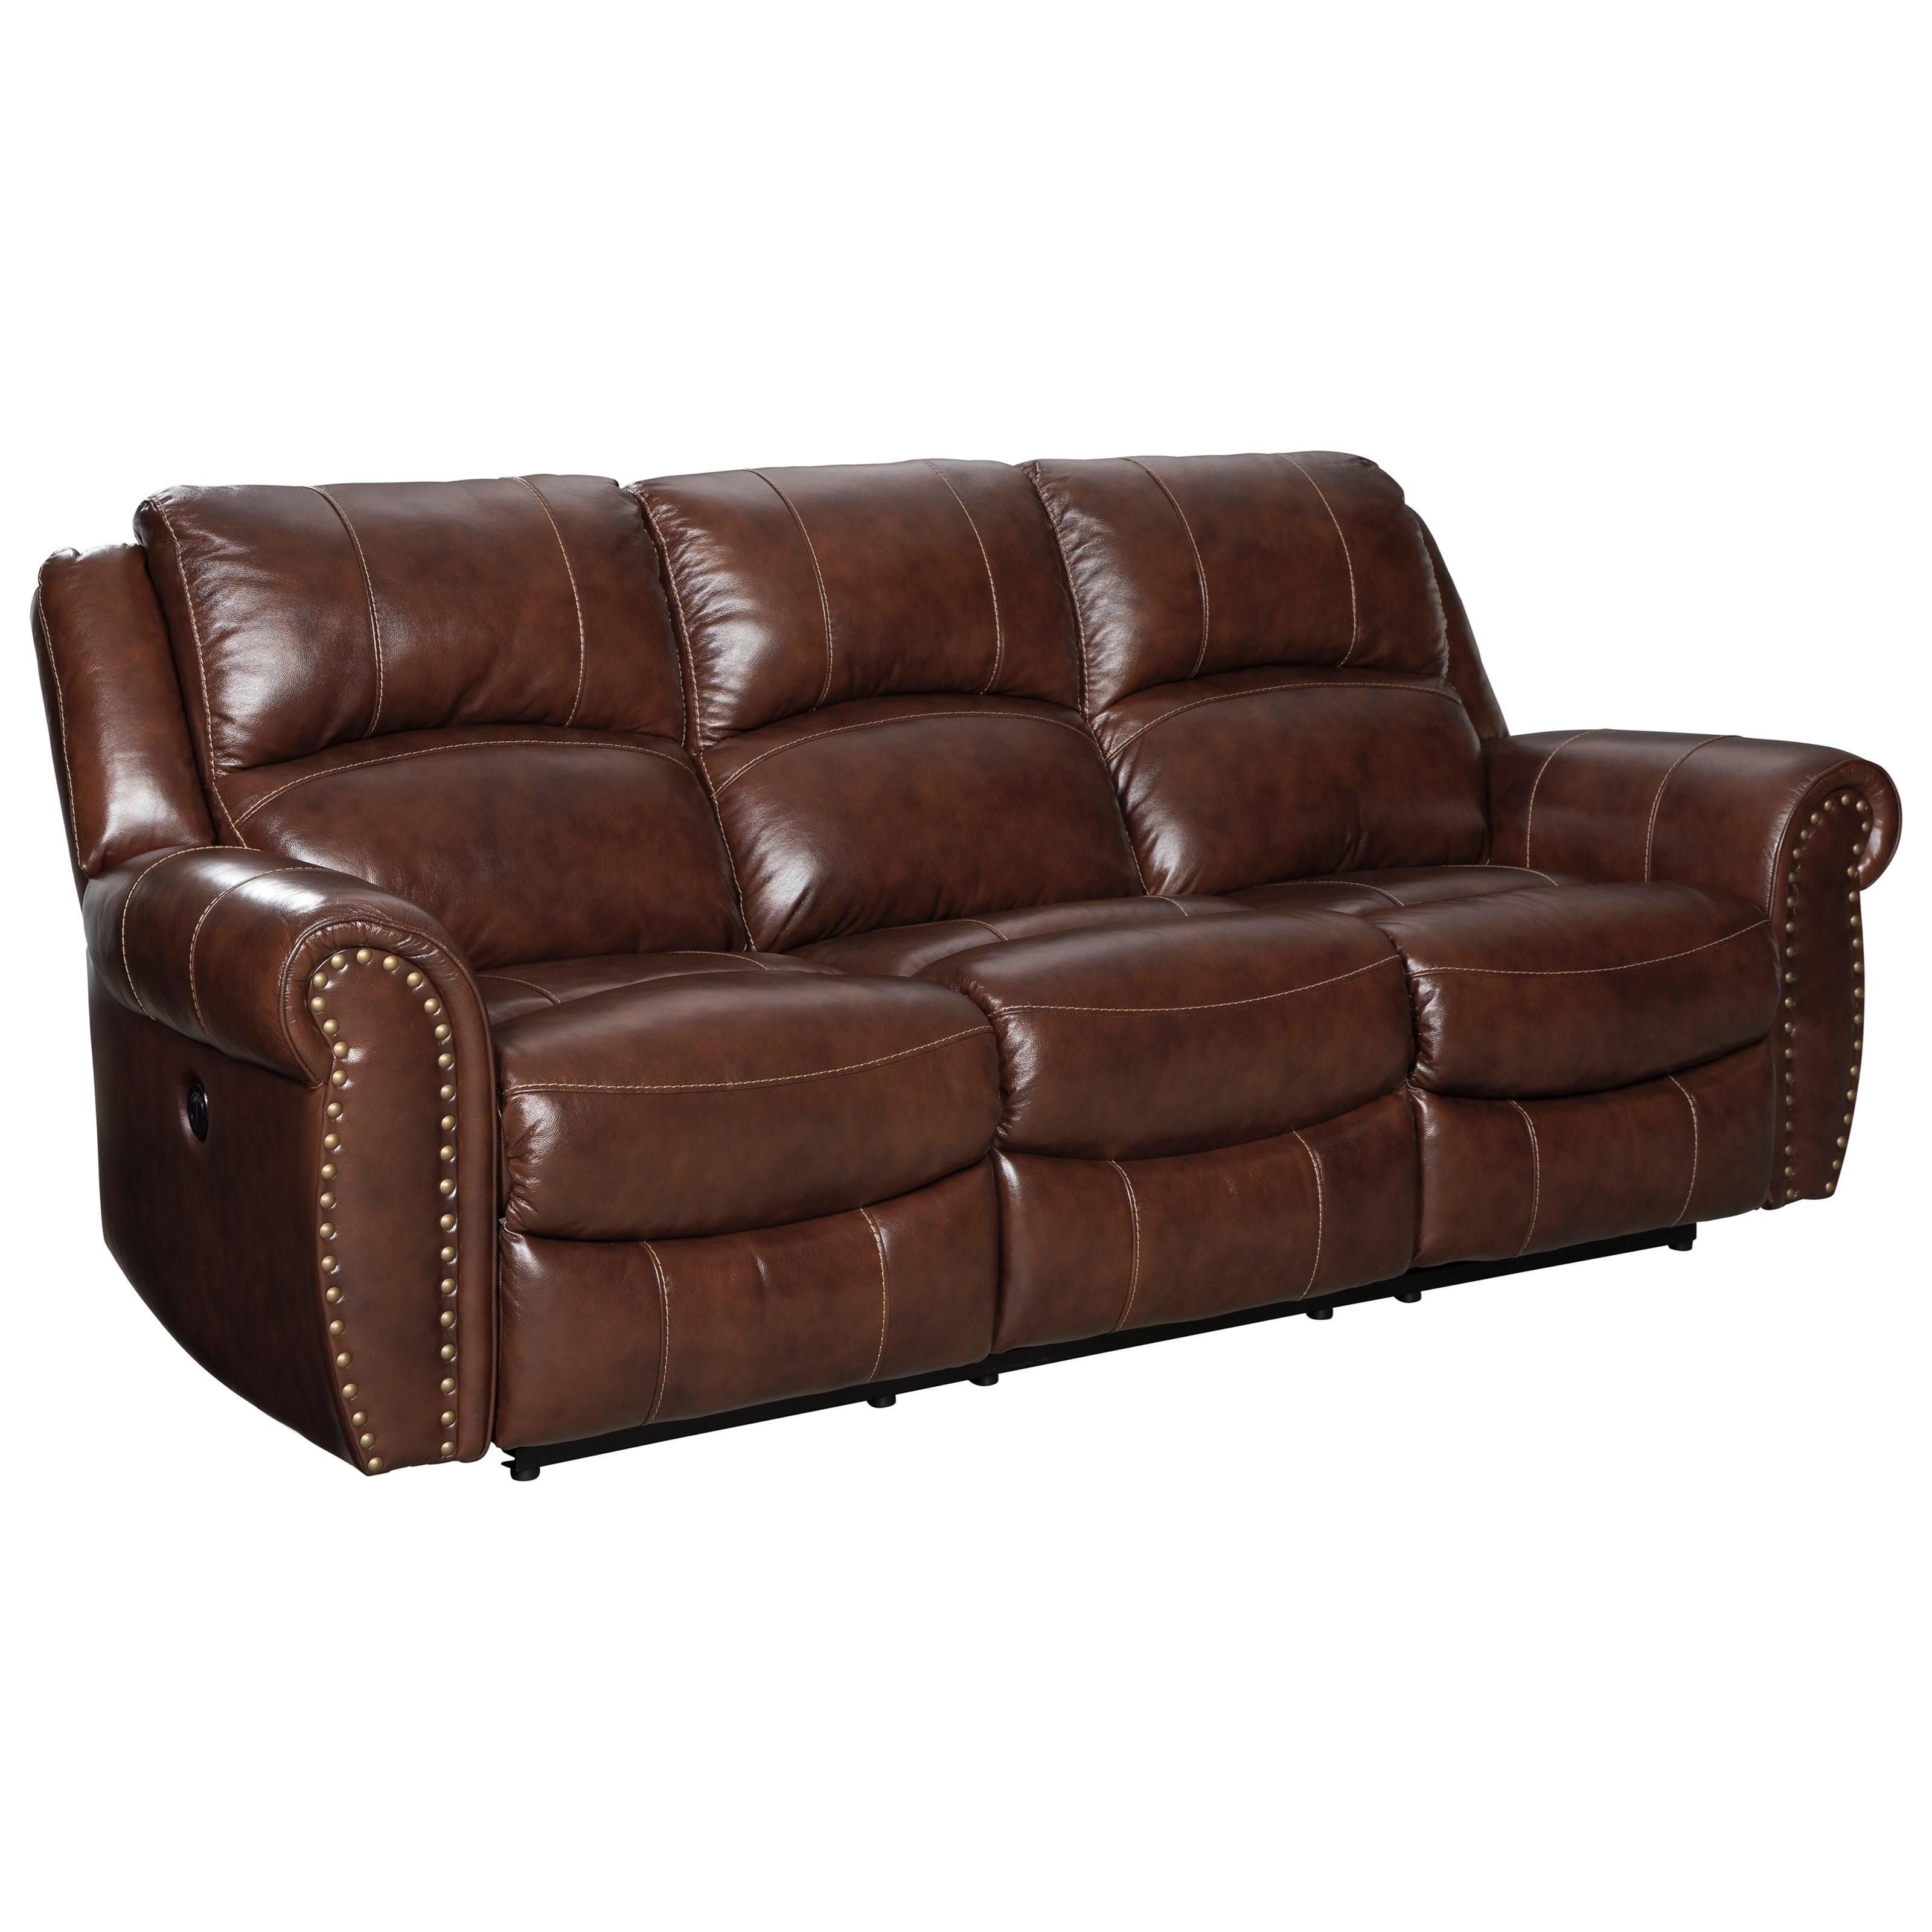 reclining sofa with nailhead trim bed leather ashley signature design bingen u4280288 traditional